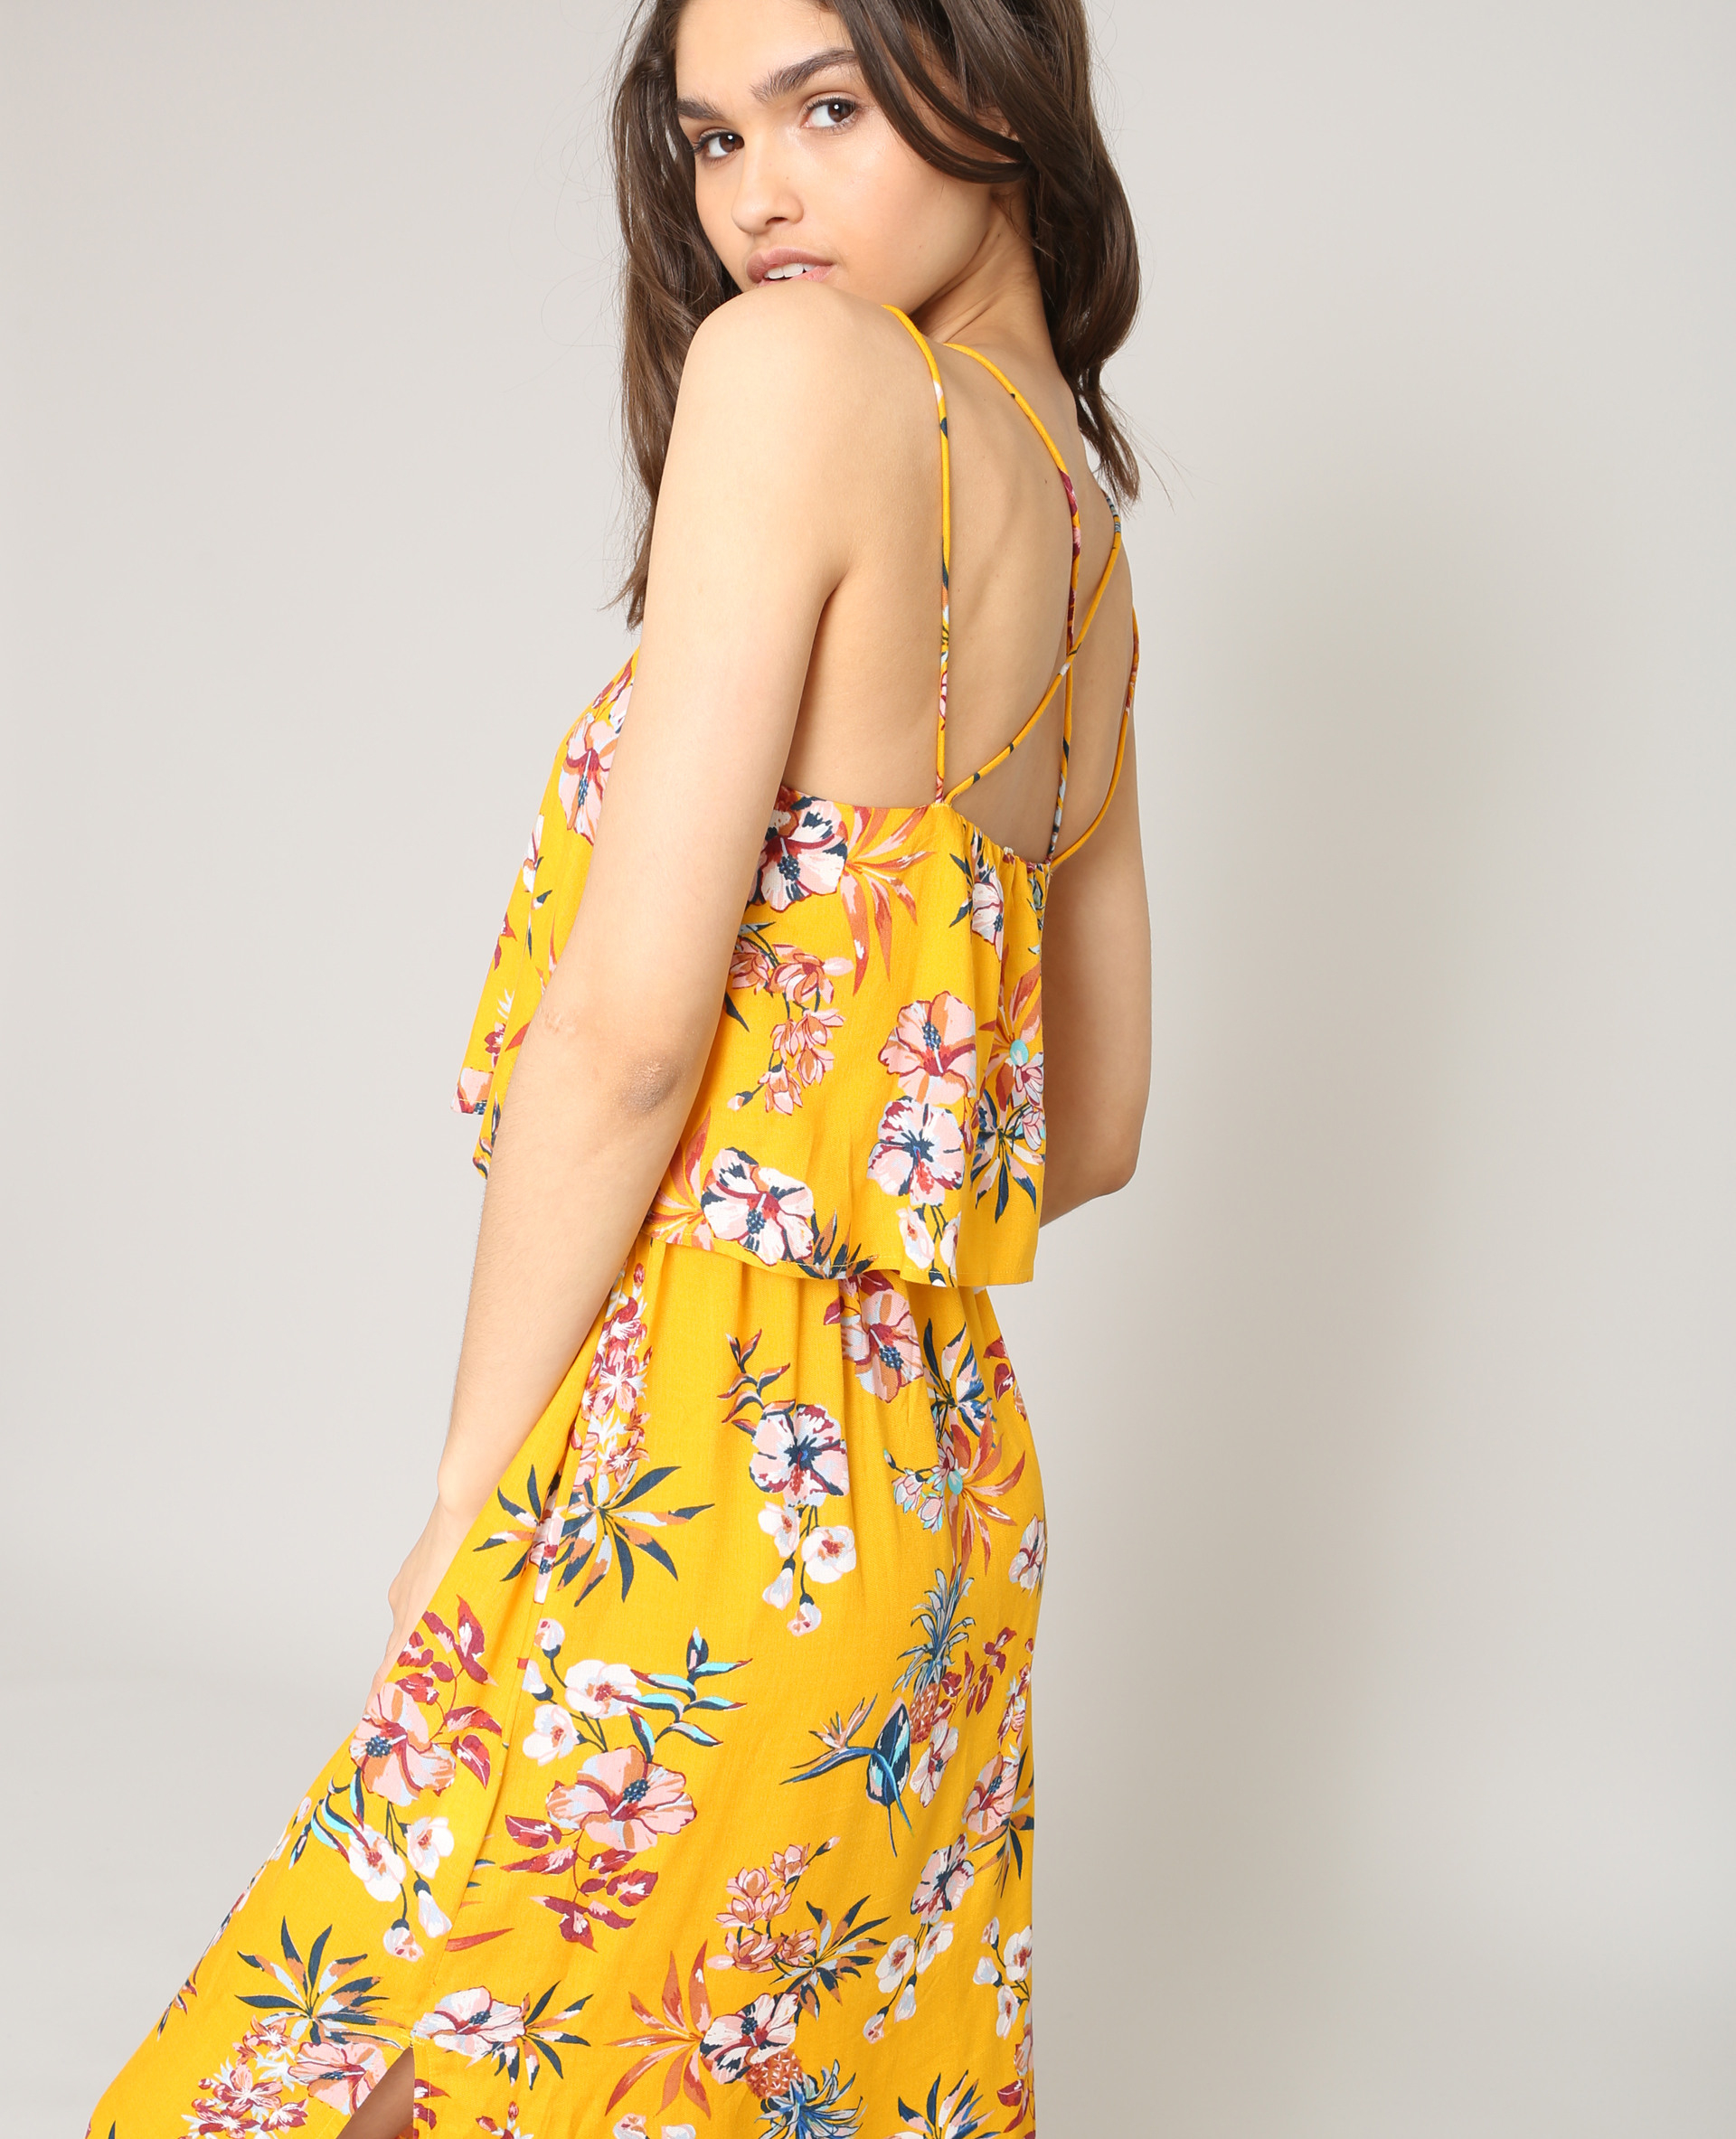 Robe Longue À Fleurs Jaune  780870061E3A  Pimkie